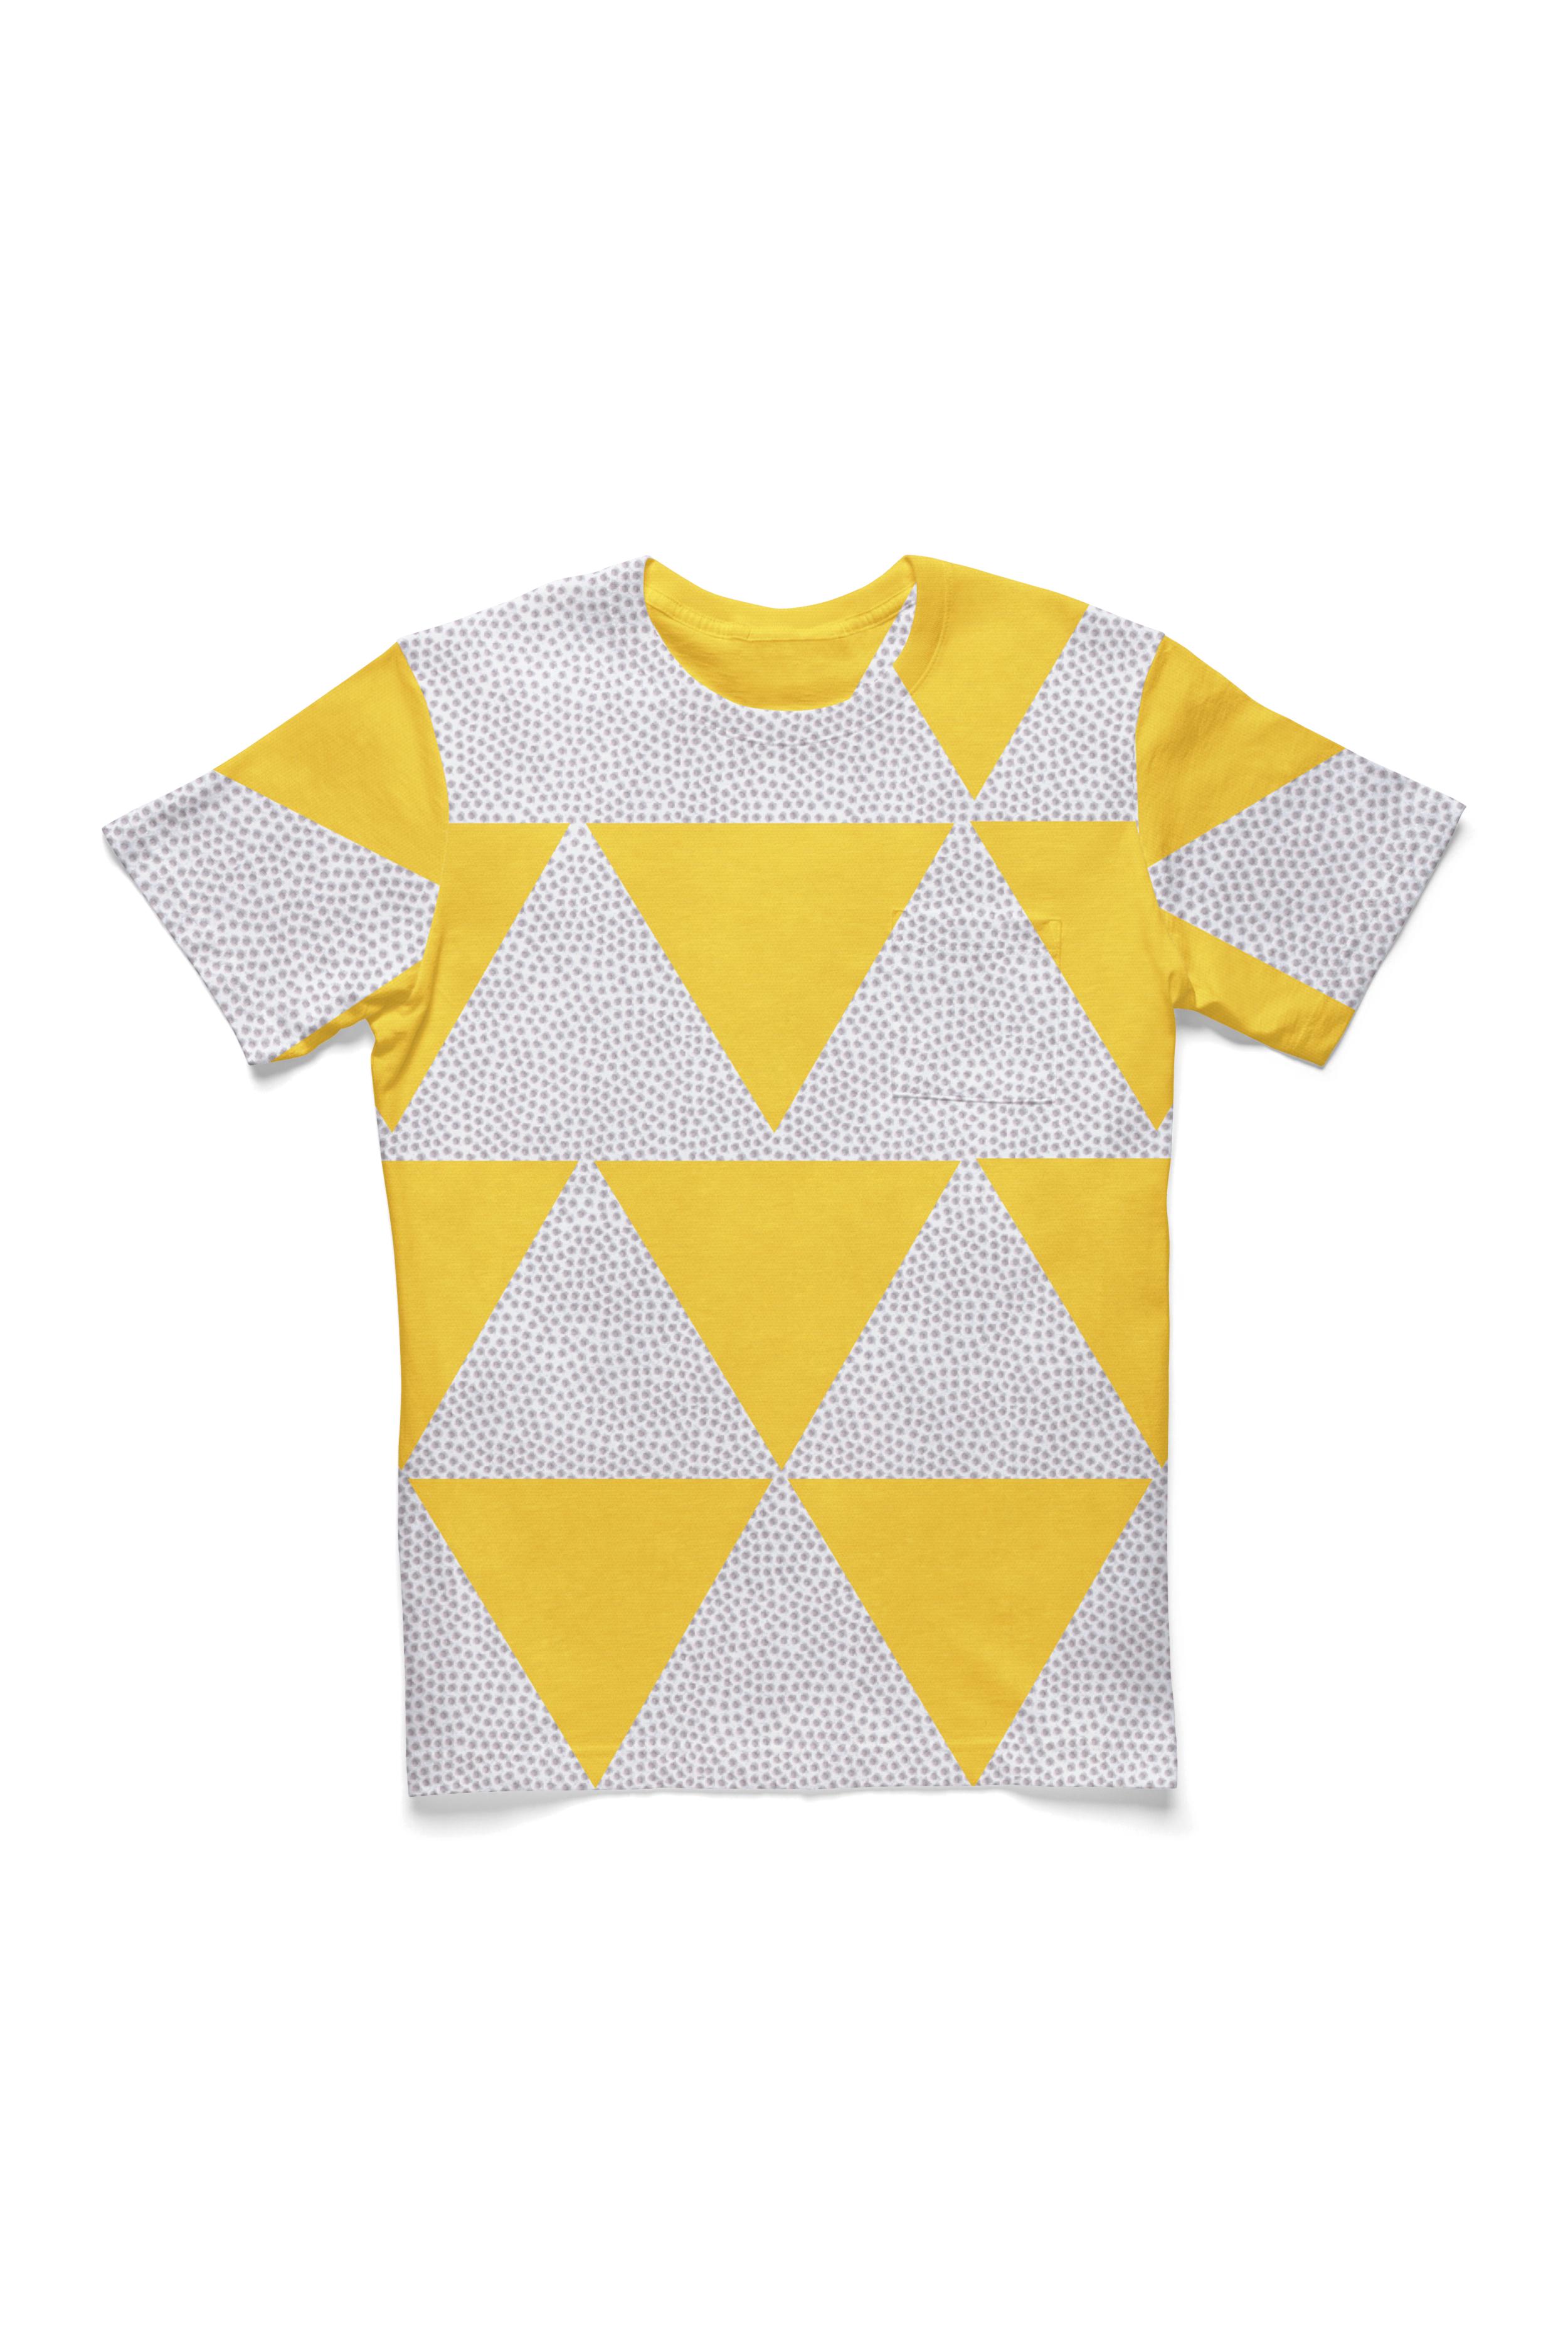 Shirt 0749-1 2016-02-14.png